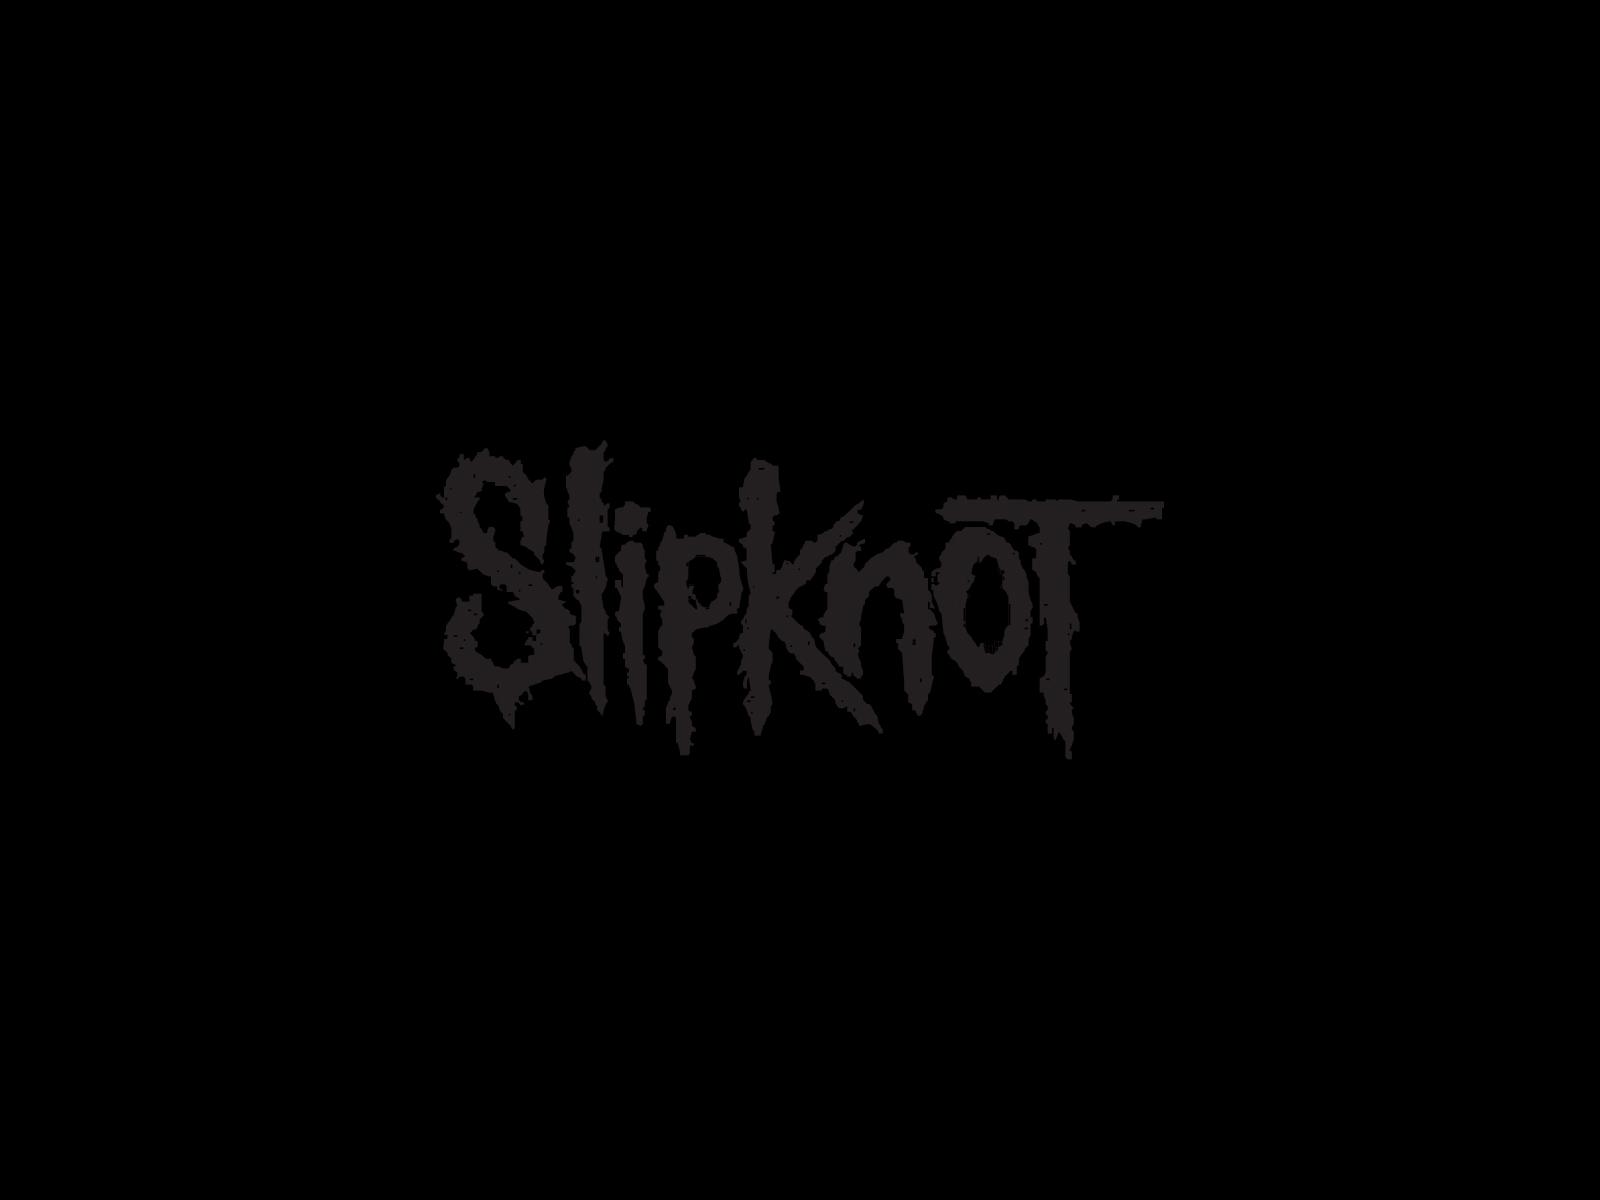 Slipknot Wallpapers HD black background